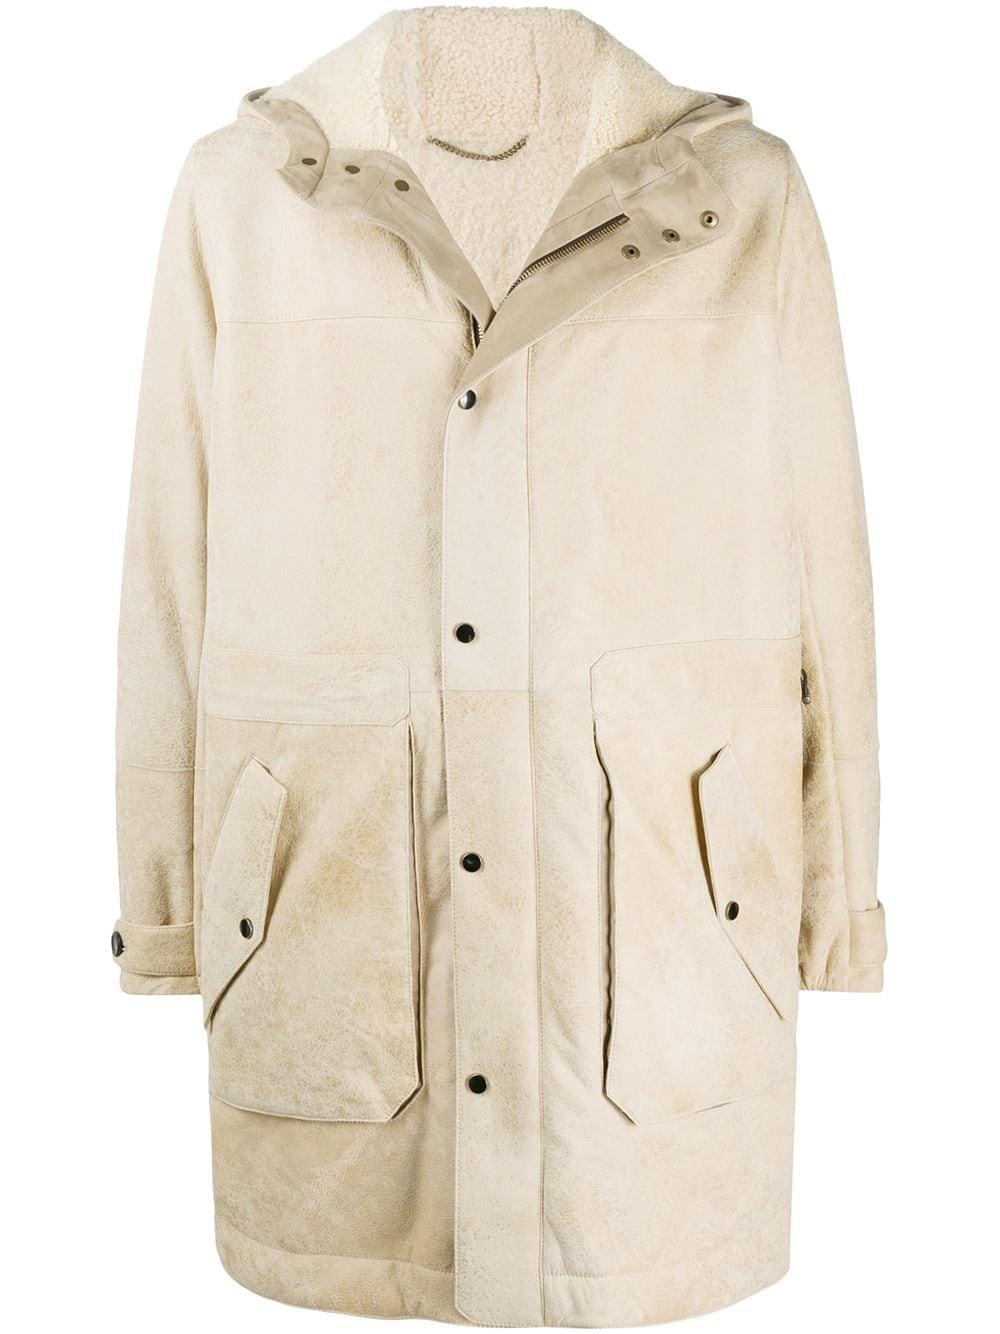 AJMONE Long-Sleeve Hooded Shearling Coat